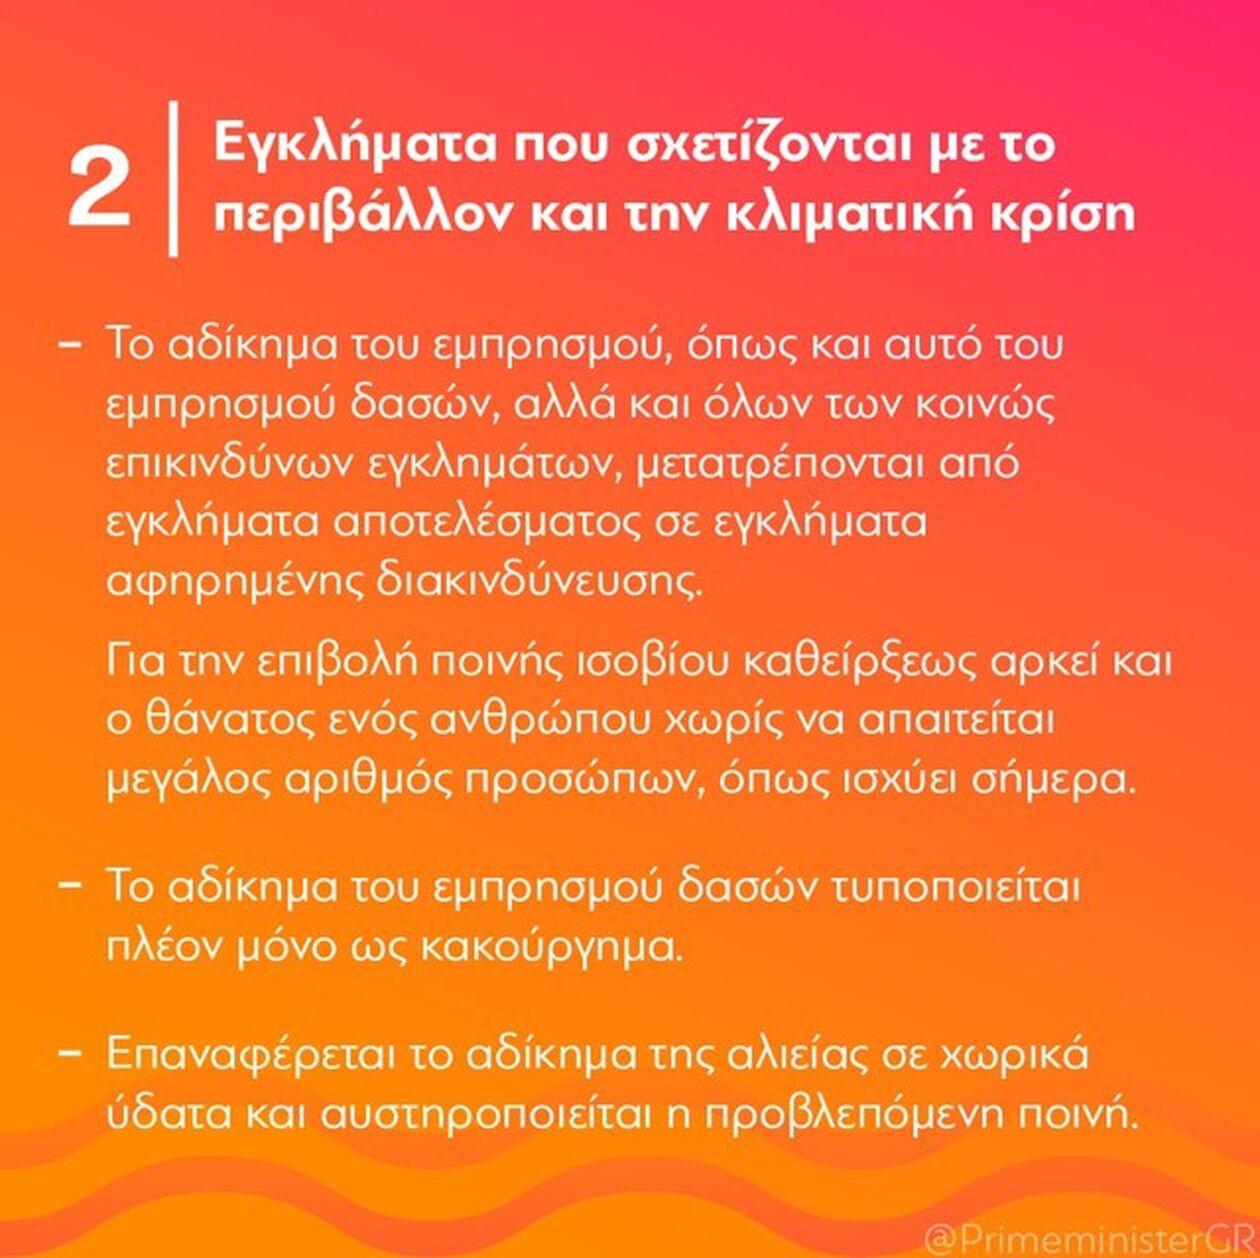 https://cdn.cnngreece.gr/media/news/2021/09/24/282848/photos/snapshot/242432812_544306549962304_6821640186849720650_n.jpg